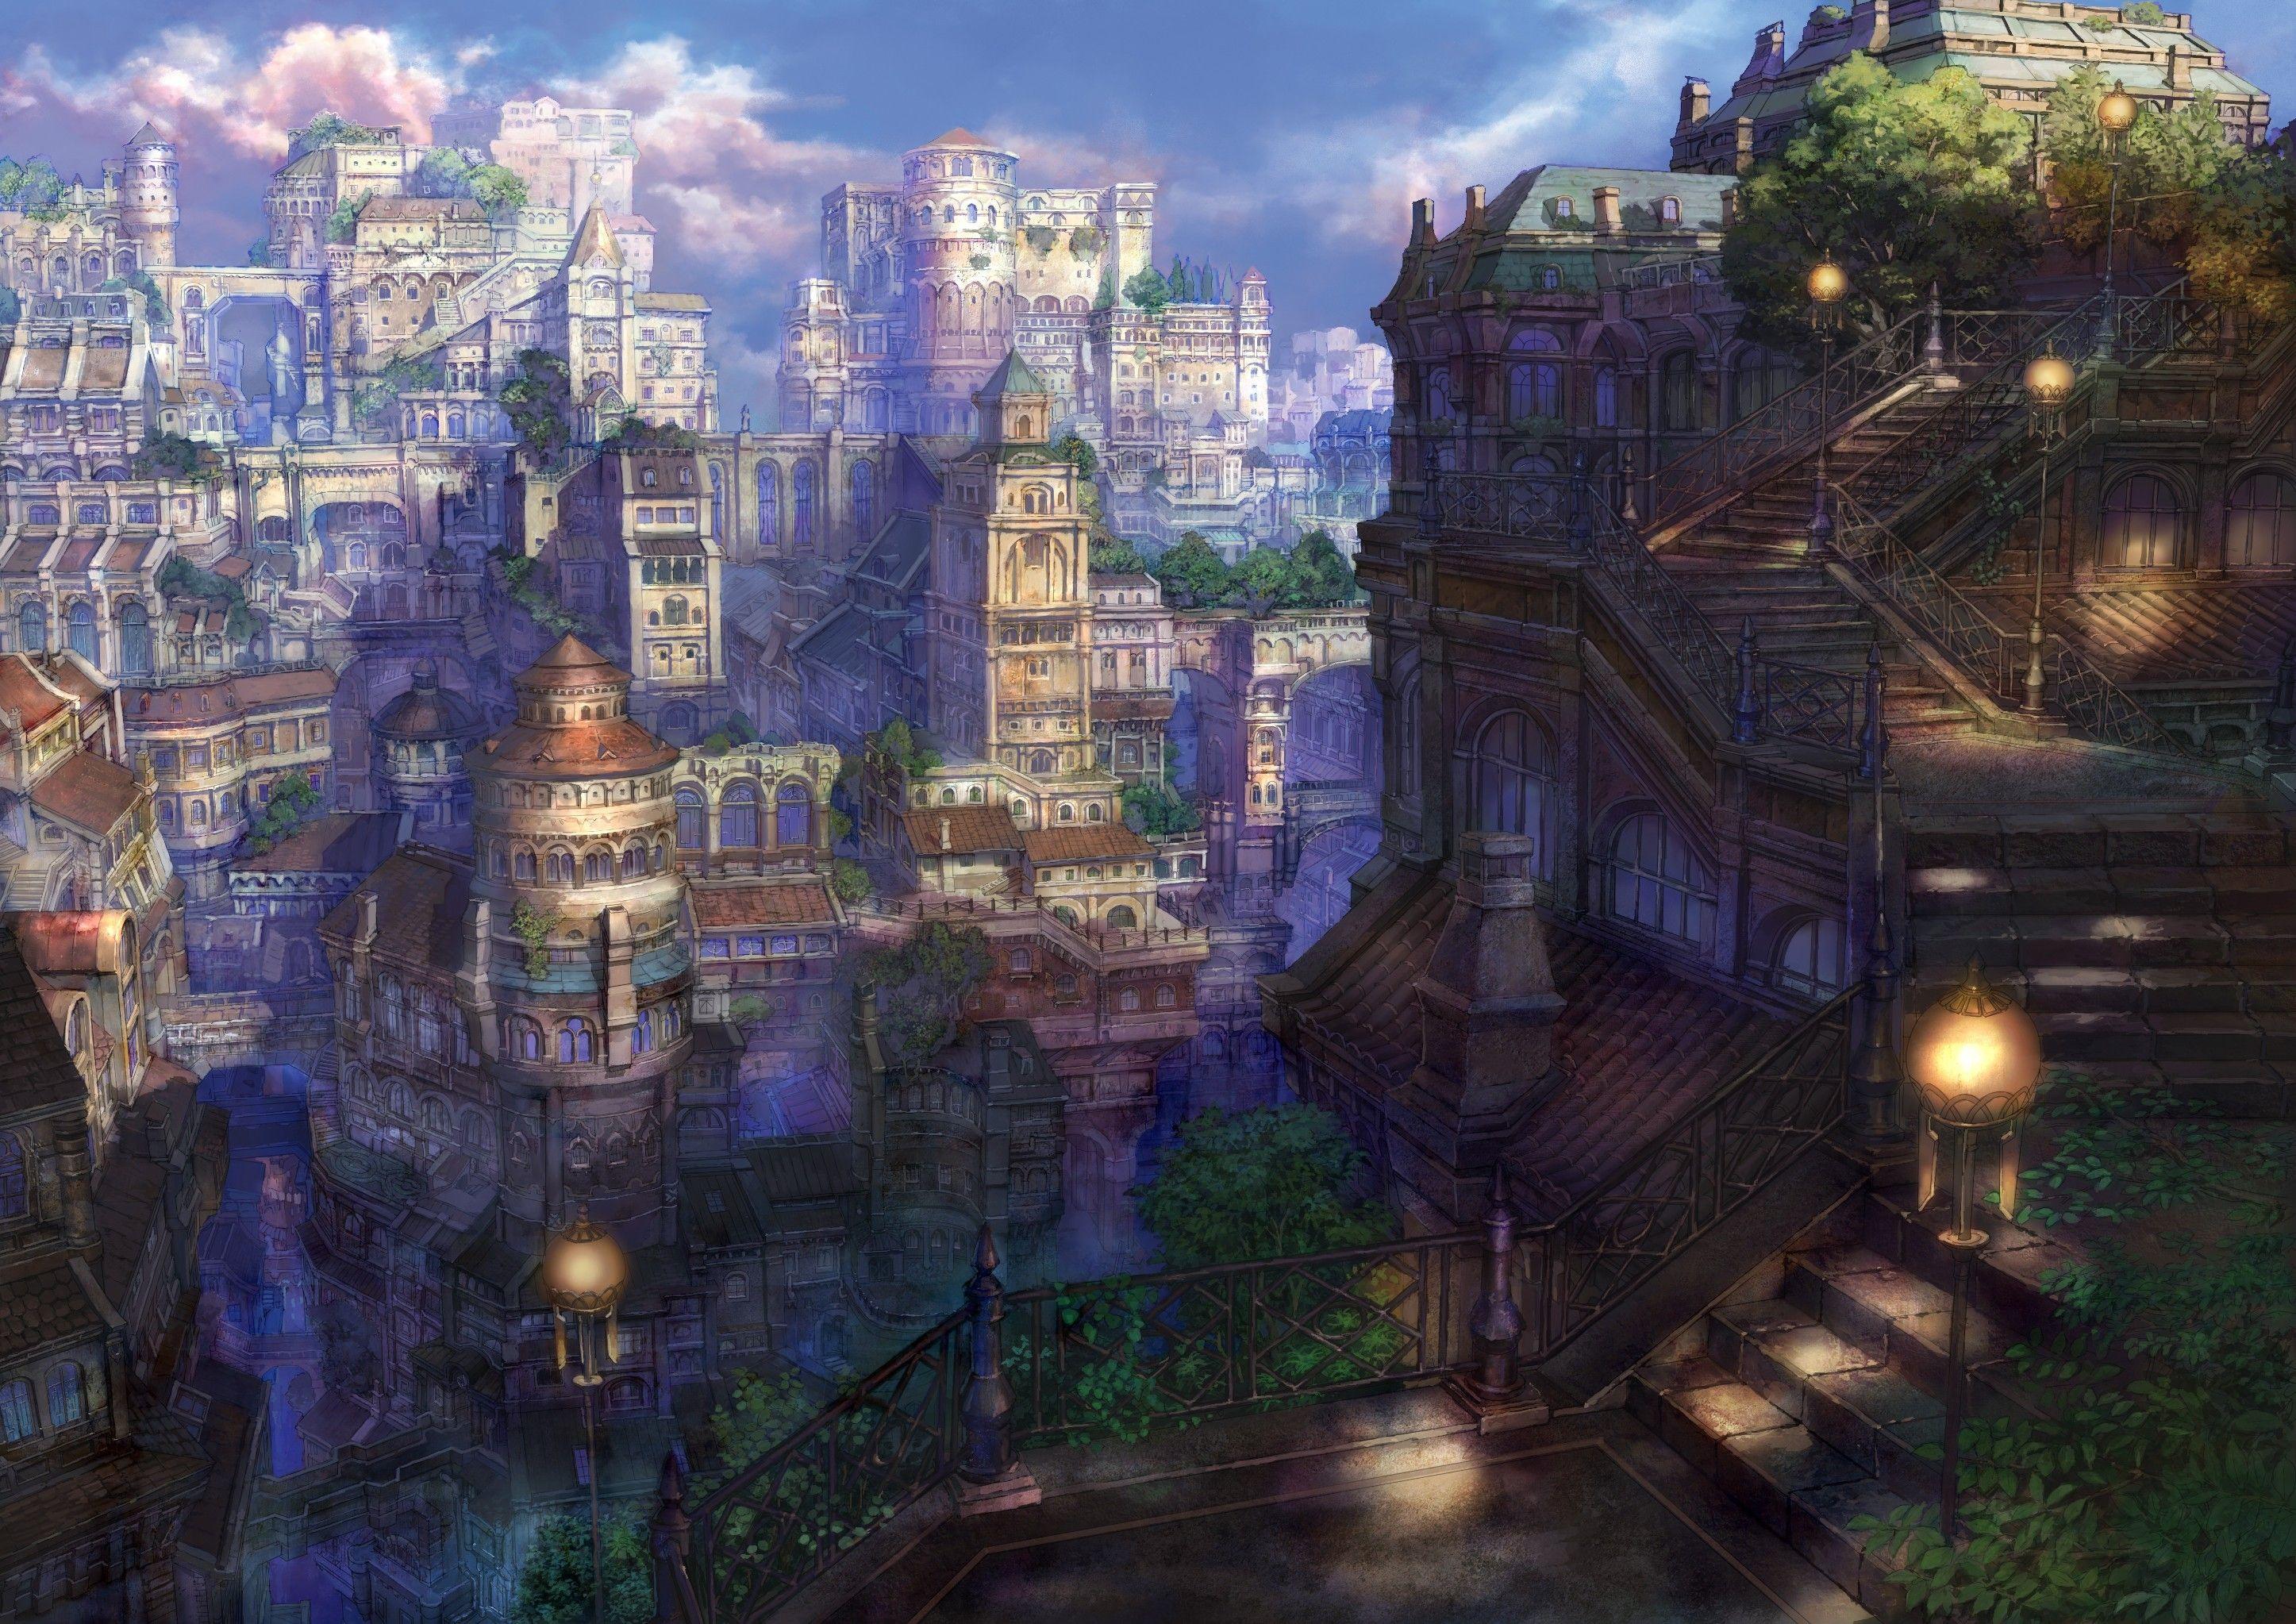 Japanese Anime Architecture Japanese Japan Wallpaper 11941 Wallhaven Cc Fantasy Town Fantasy City City Landscape